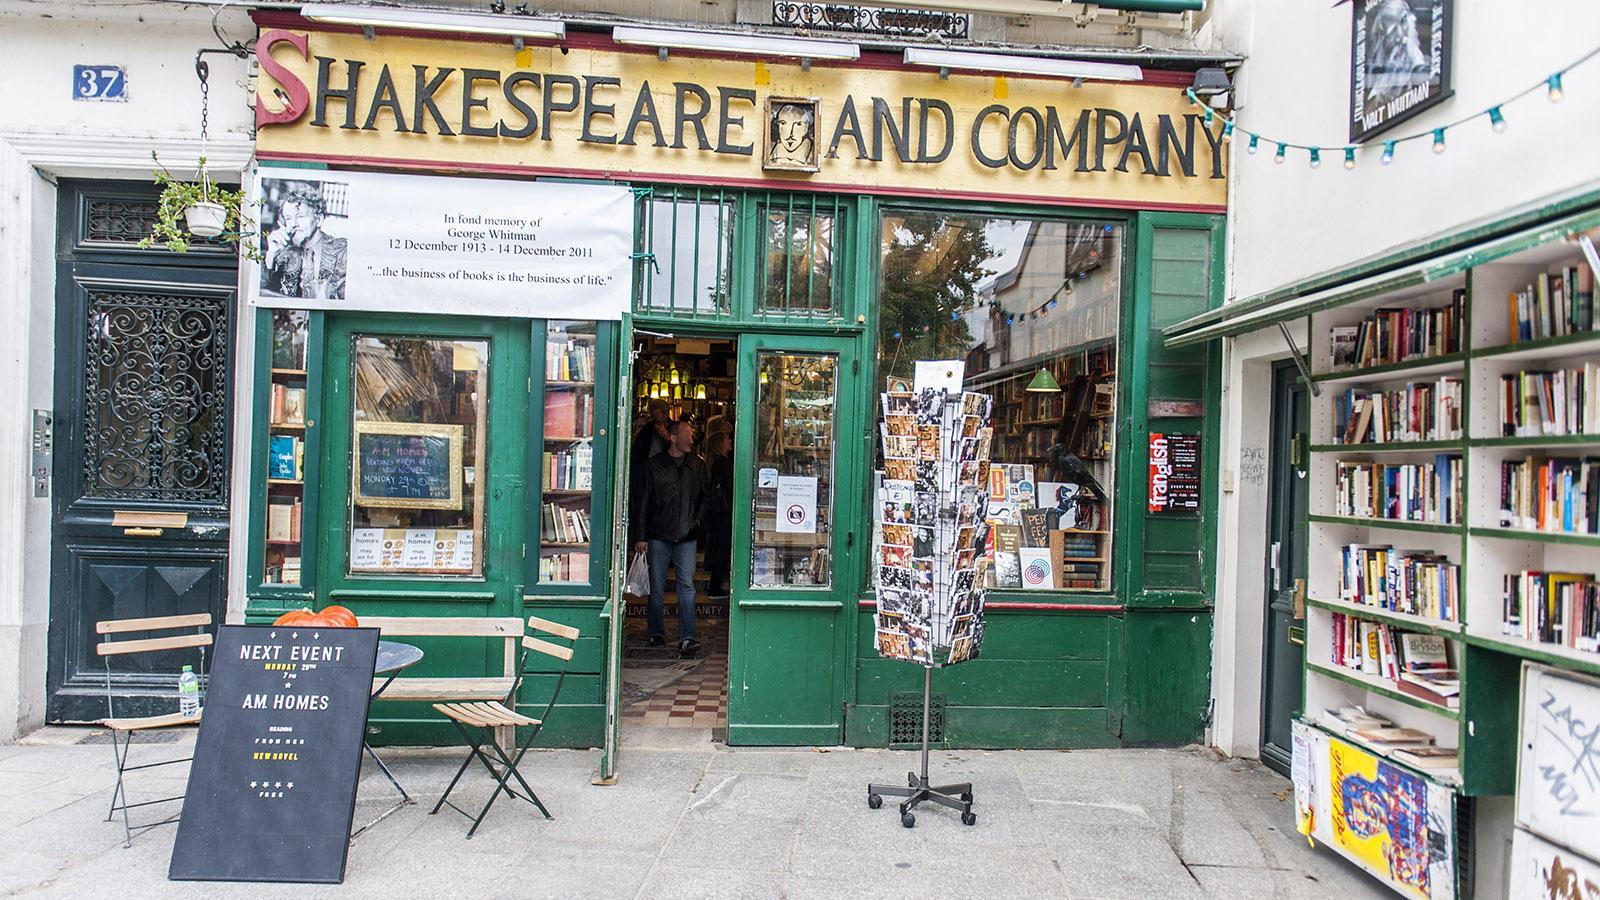 Kultladen für Leseratten: Shakespeare and Company. Foto: Hilke Maunder